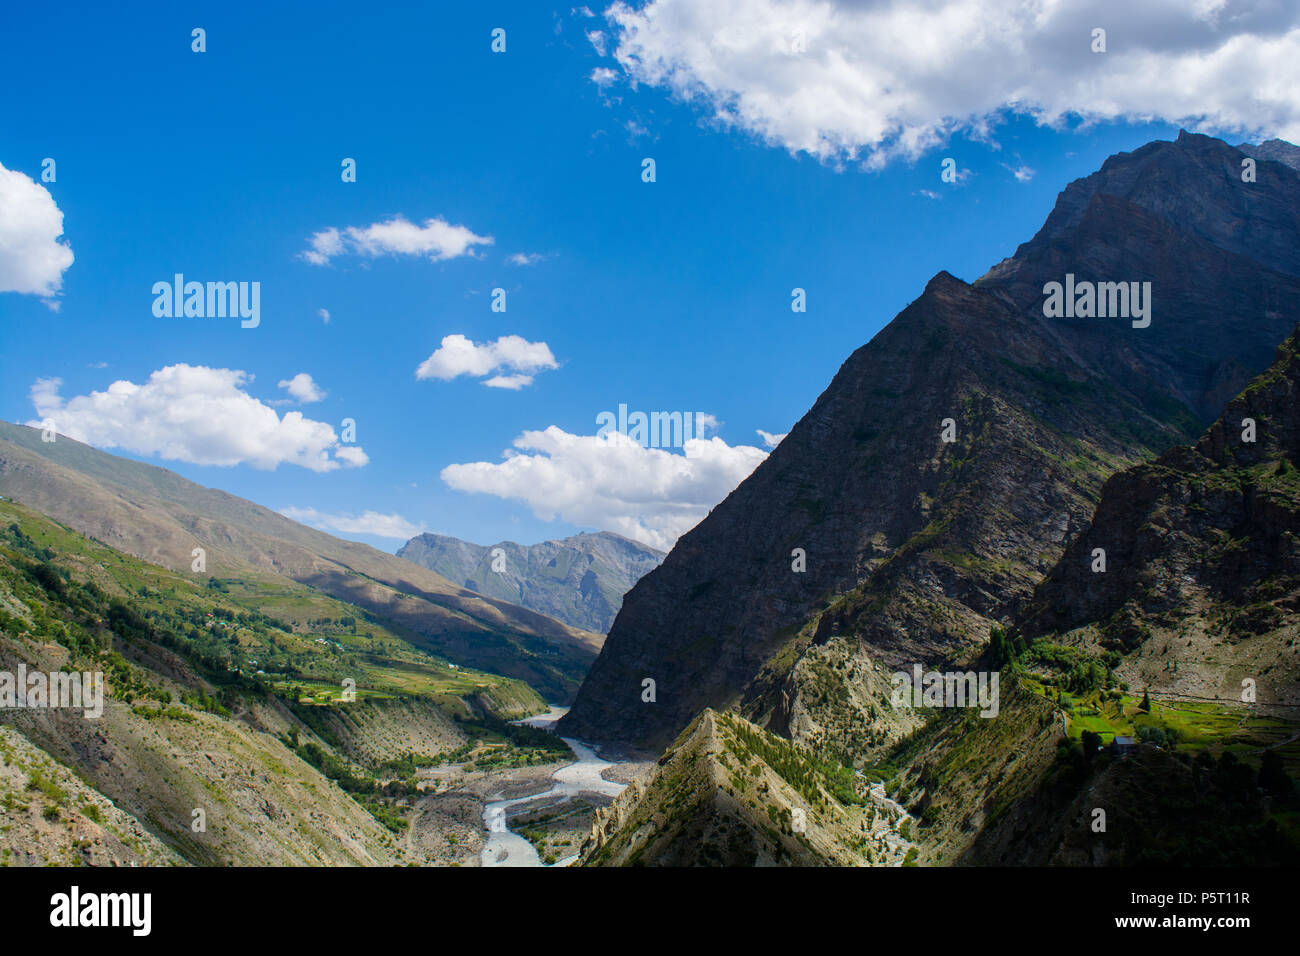 The beautiful landscapes of Keylong,Himachal Pradesh - Stock Image